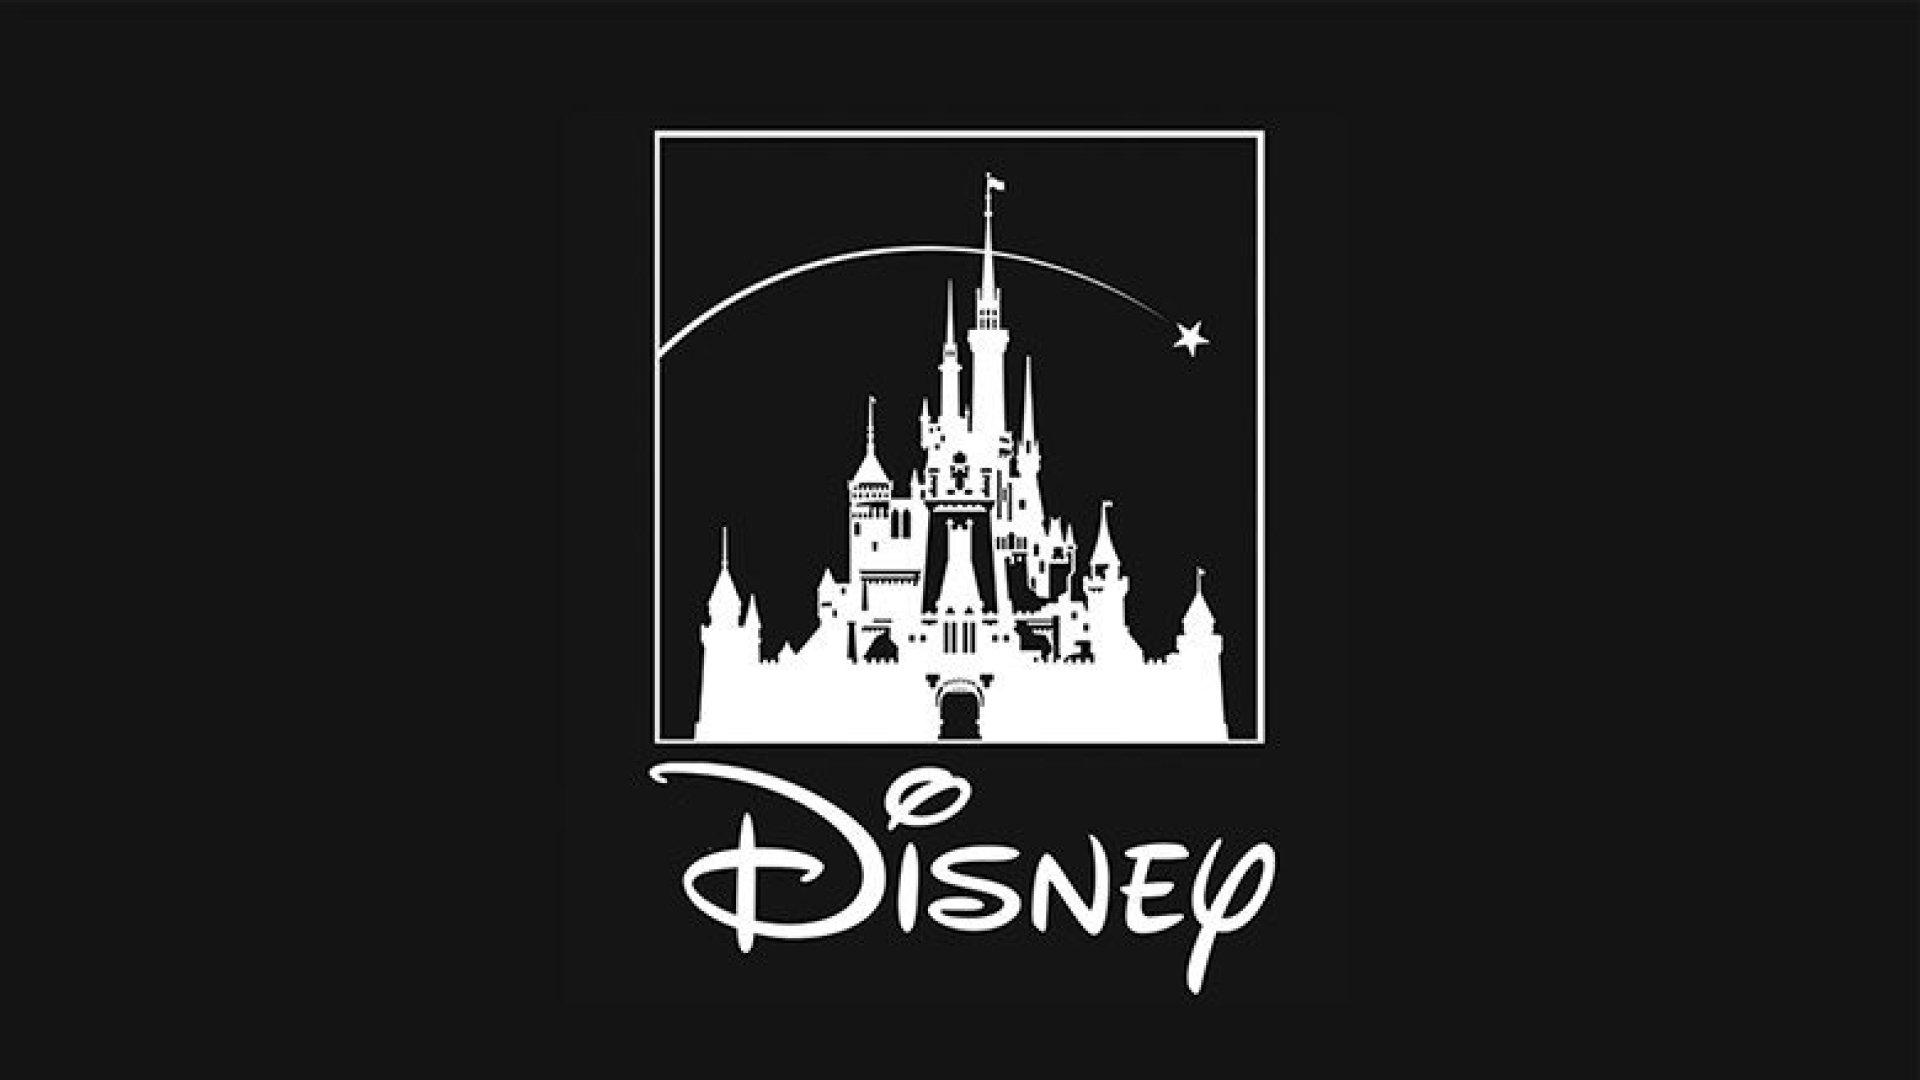 Disney and Royal Caribbean pledge $1 million to Dorian